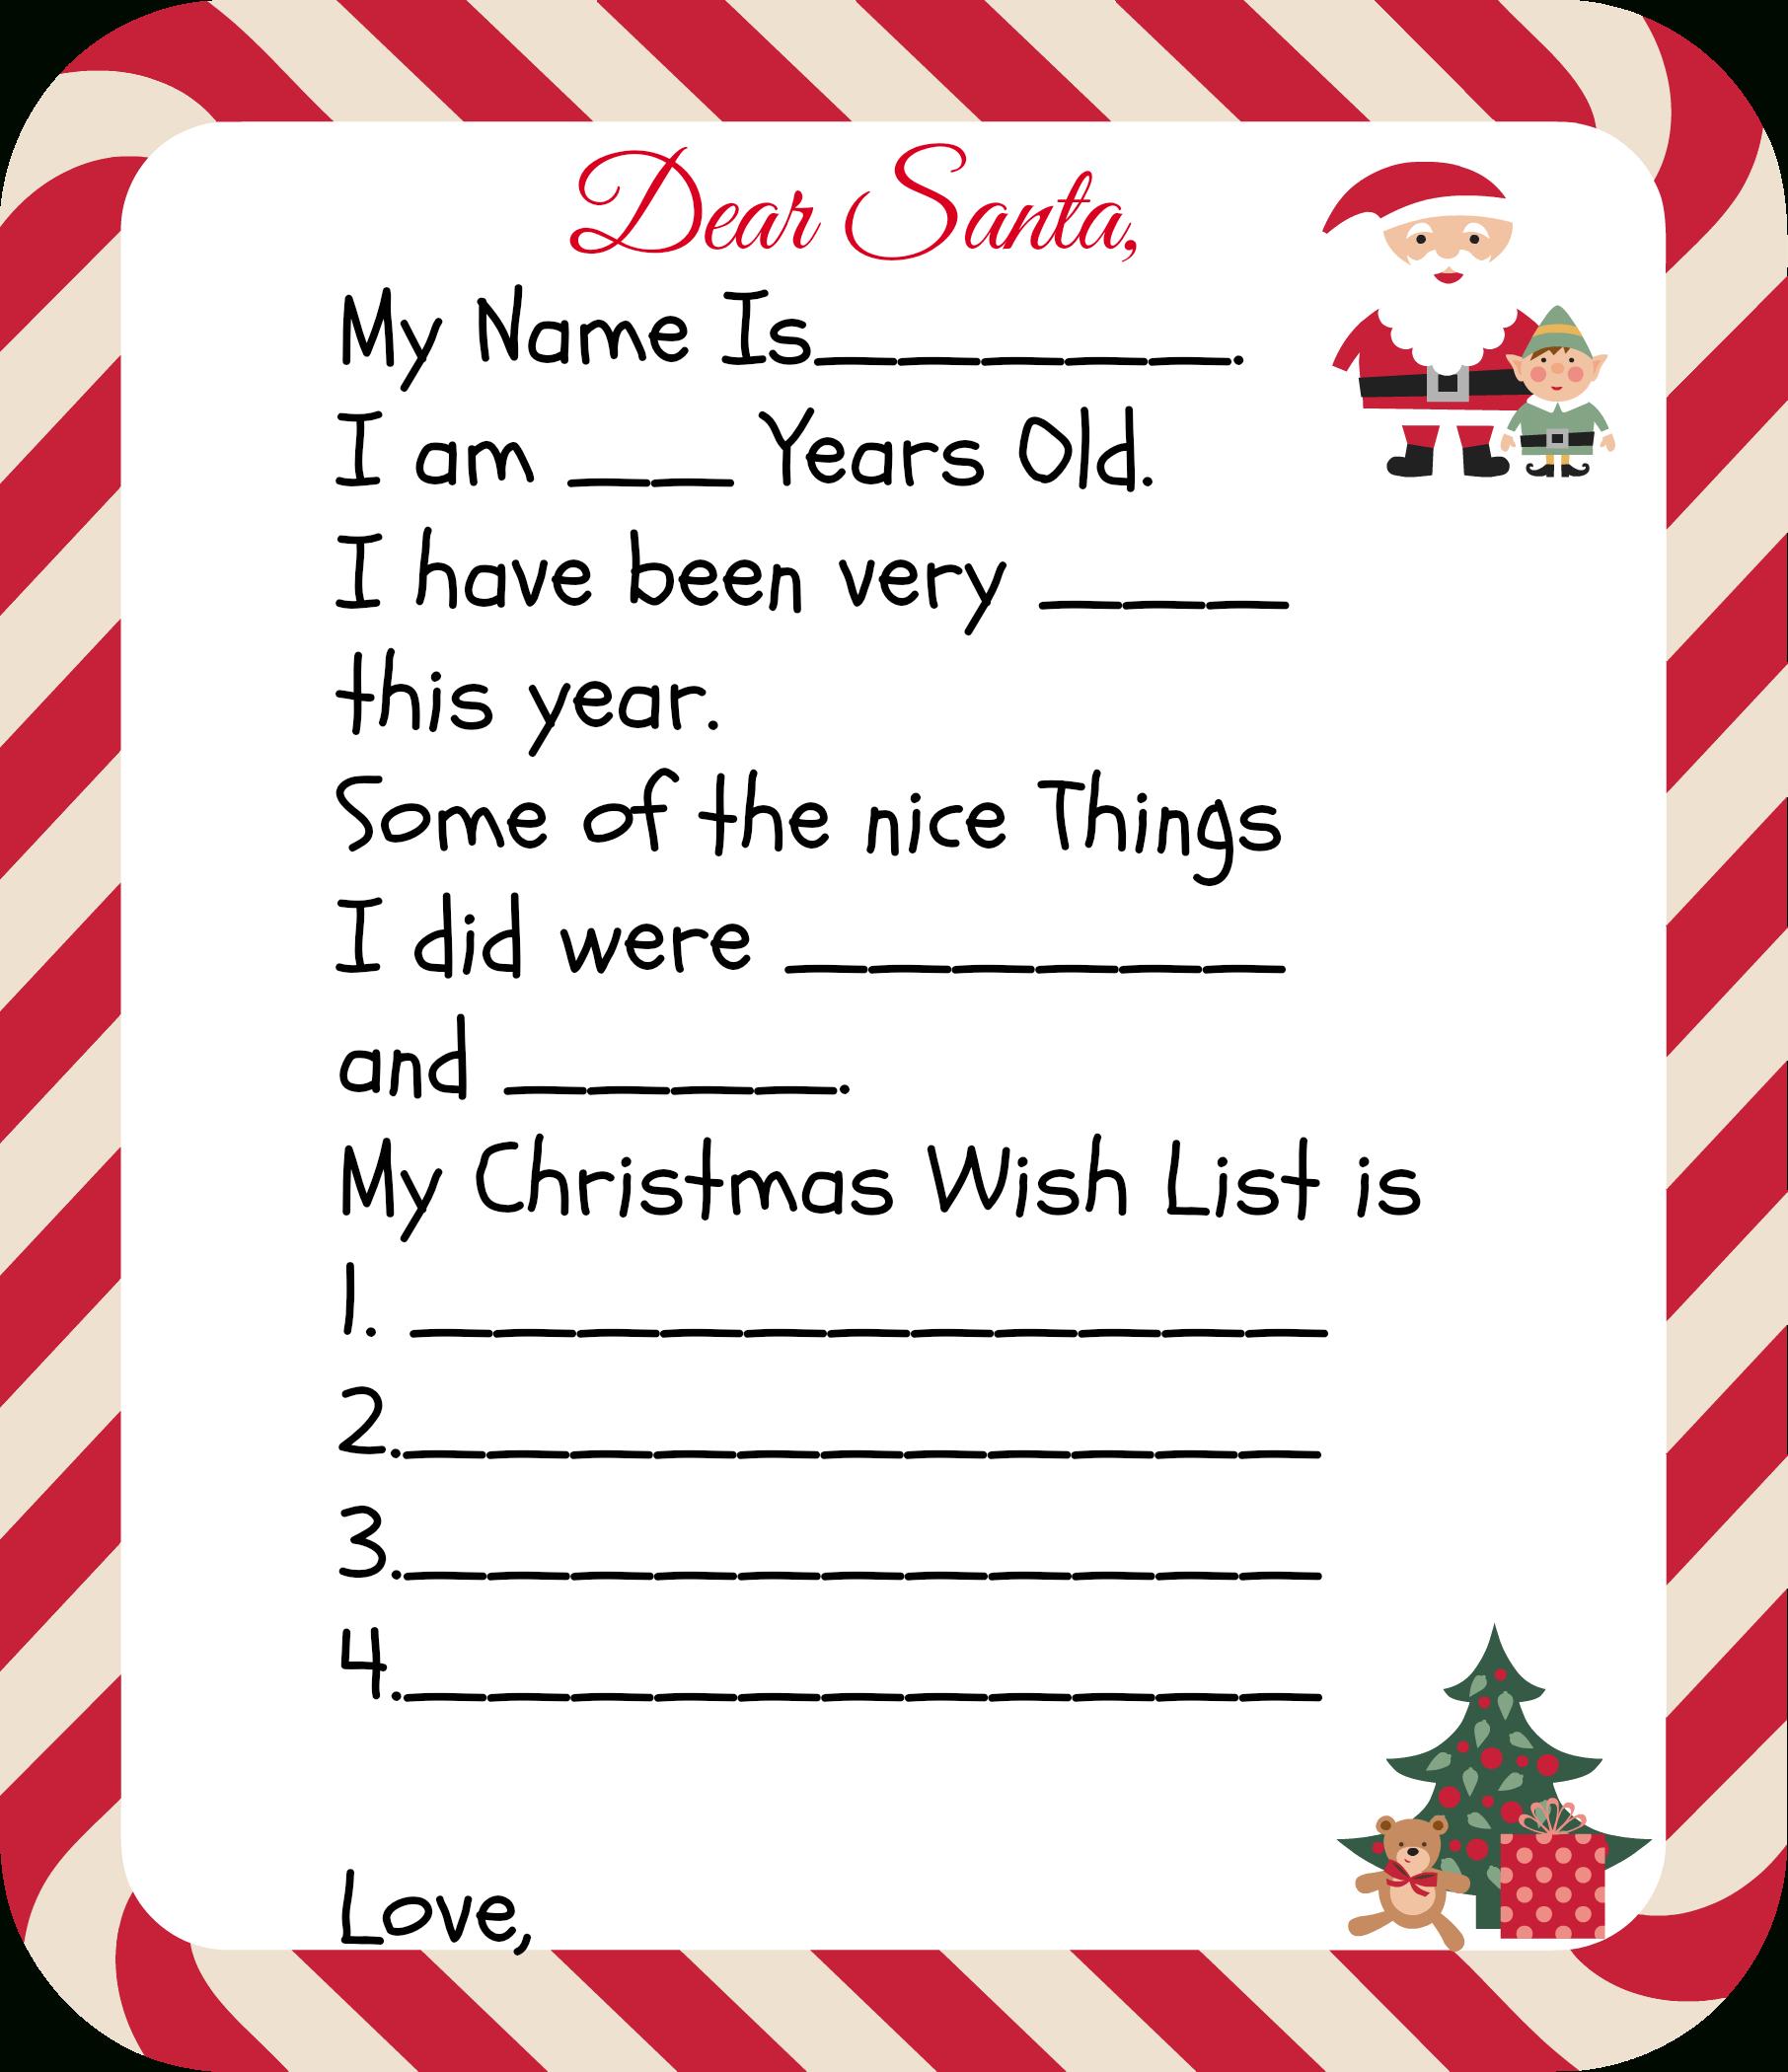 Free Printable Santa Letters For Kids | Holiday Ideas: Christmas - Free Printable Dear Santa Stationary